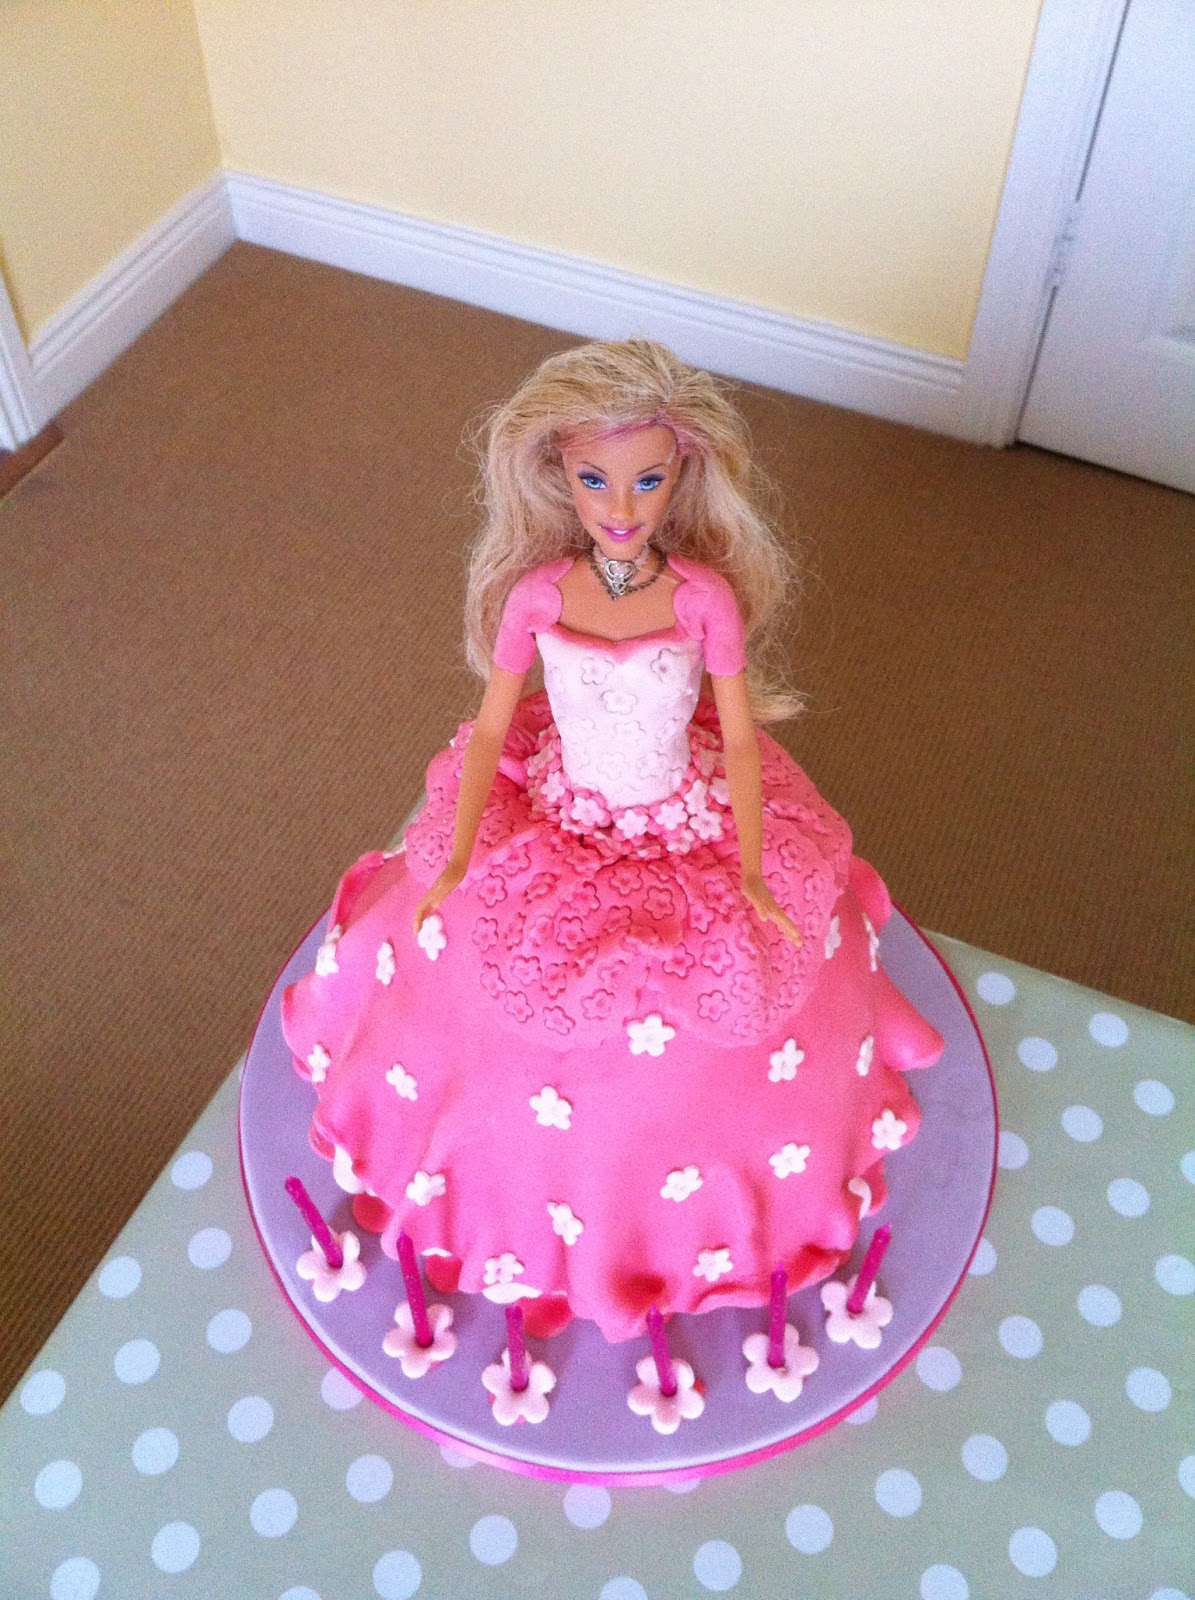 Strictly Baking: Barbie Doll Cake